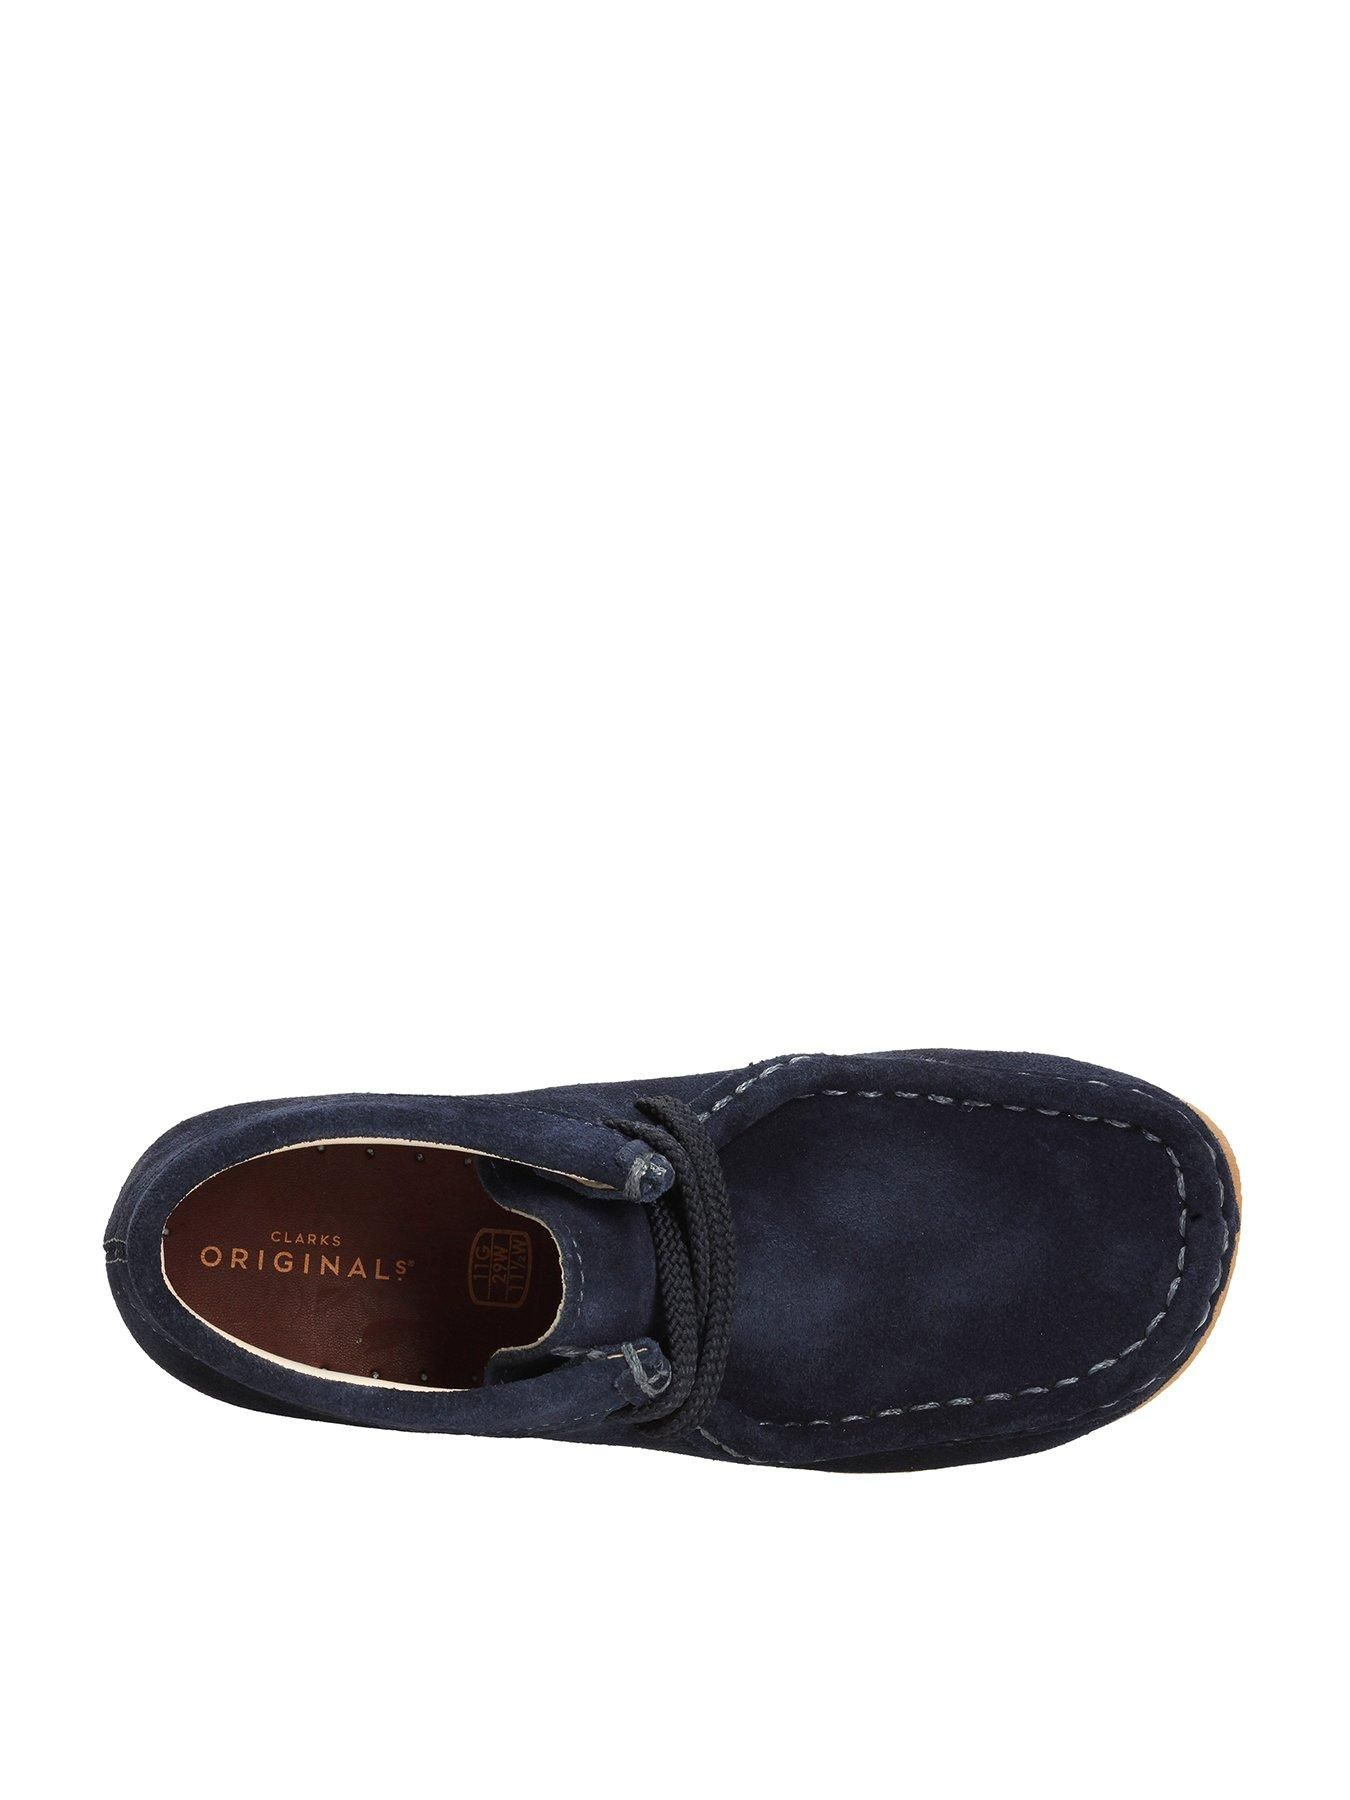 Clarks Originals Mens Jink Navy Suede Lace up Shoes Various Sizes